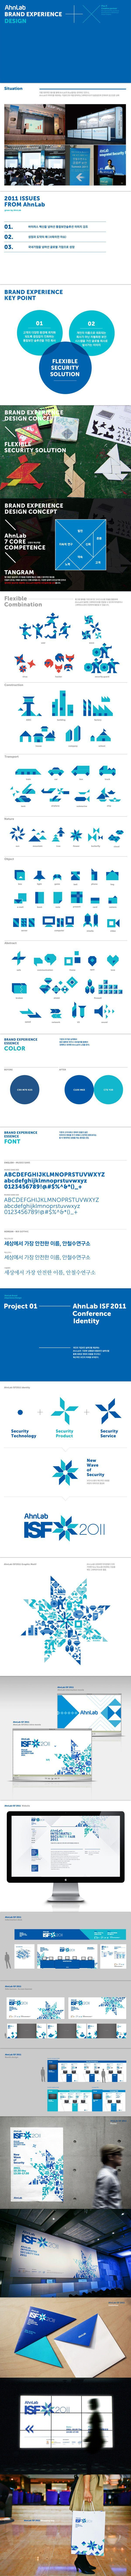 AhnLab Brand eXperience Desgin by Cooky Yoon, via Behance